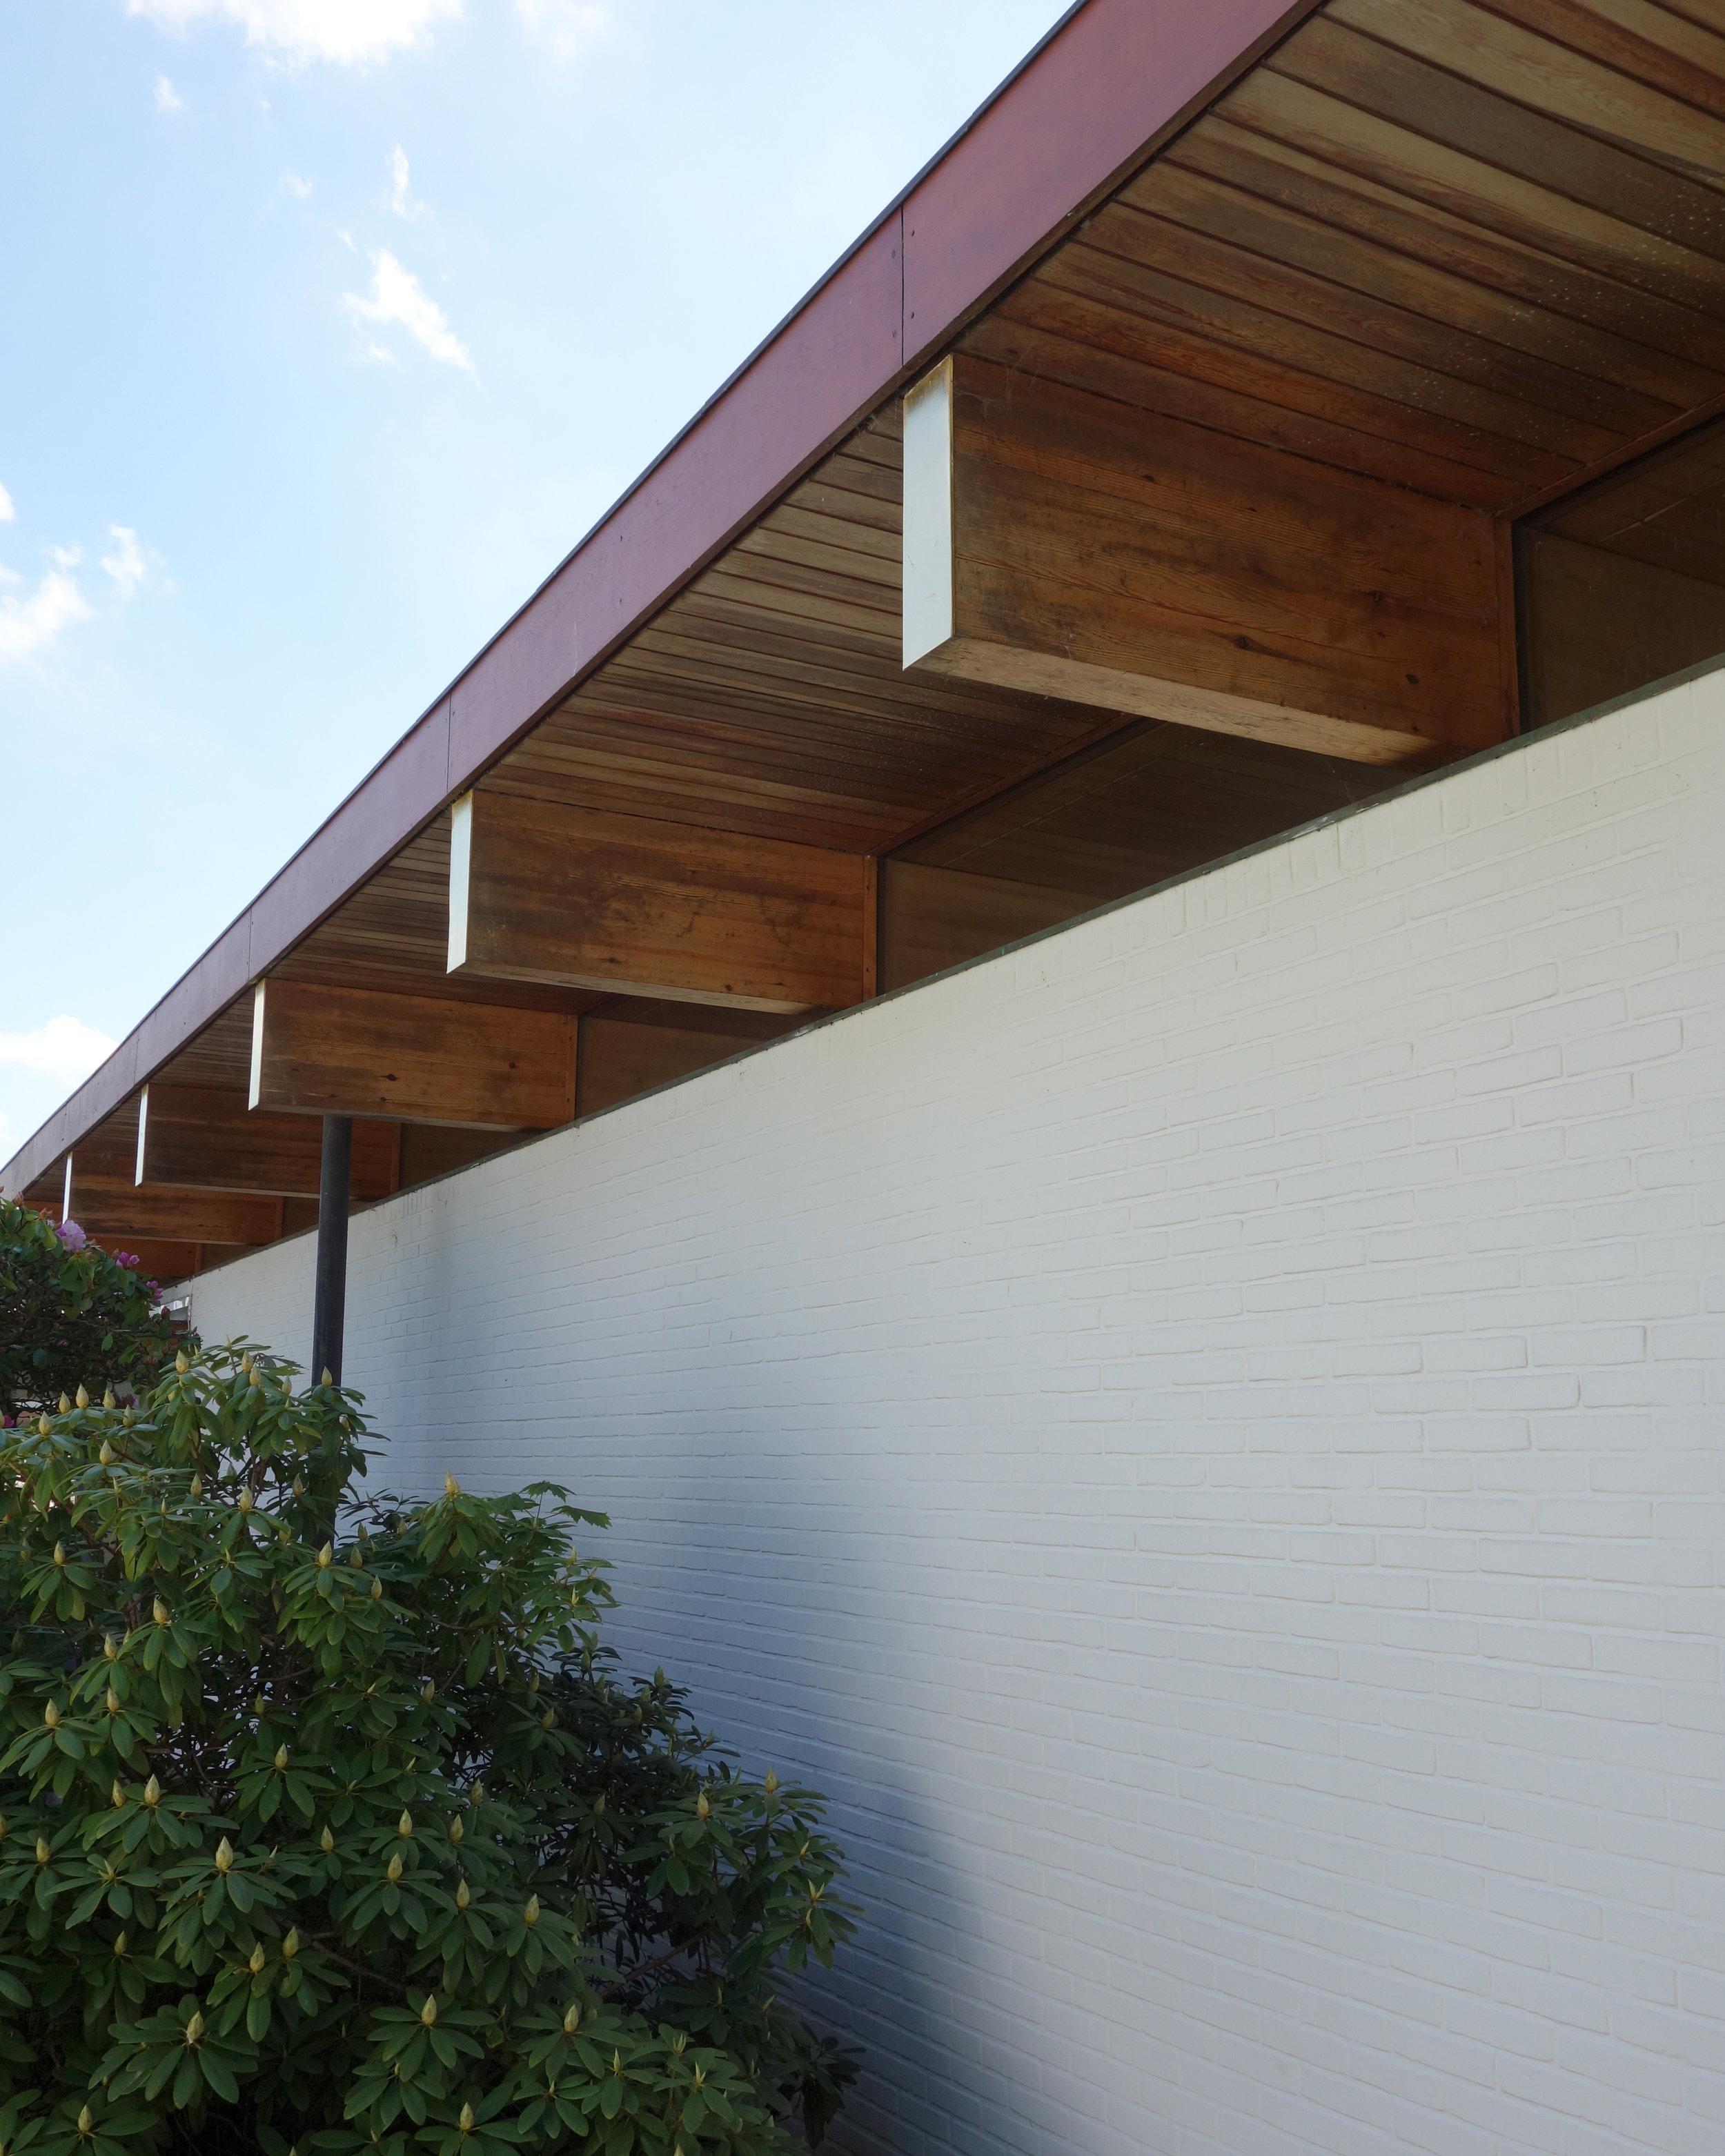 Louisiana Museum of Modern Art - VISIT